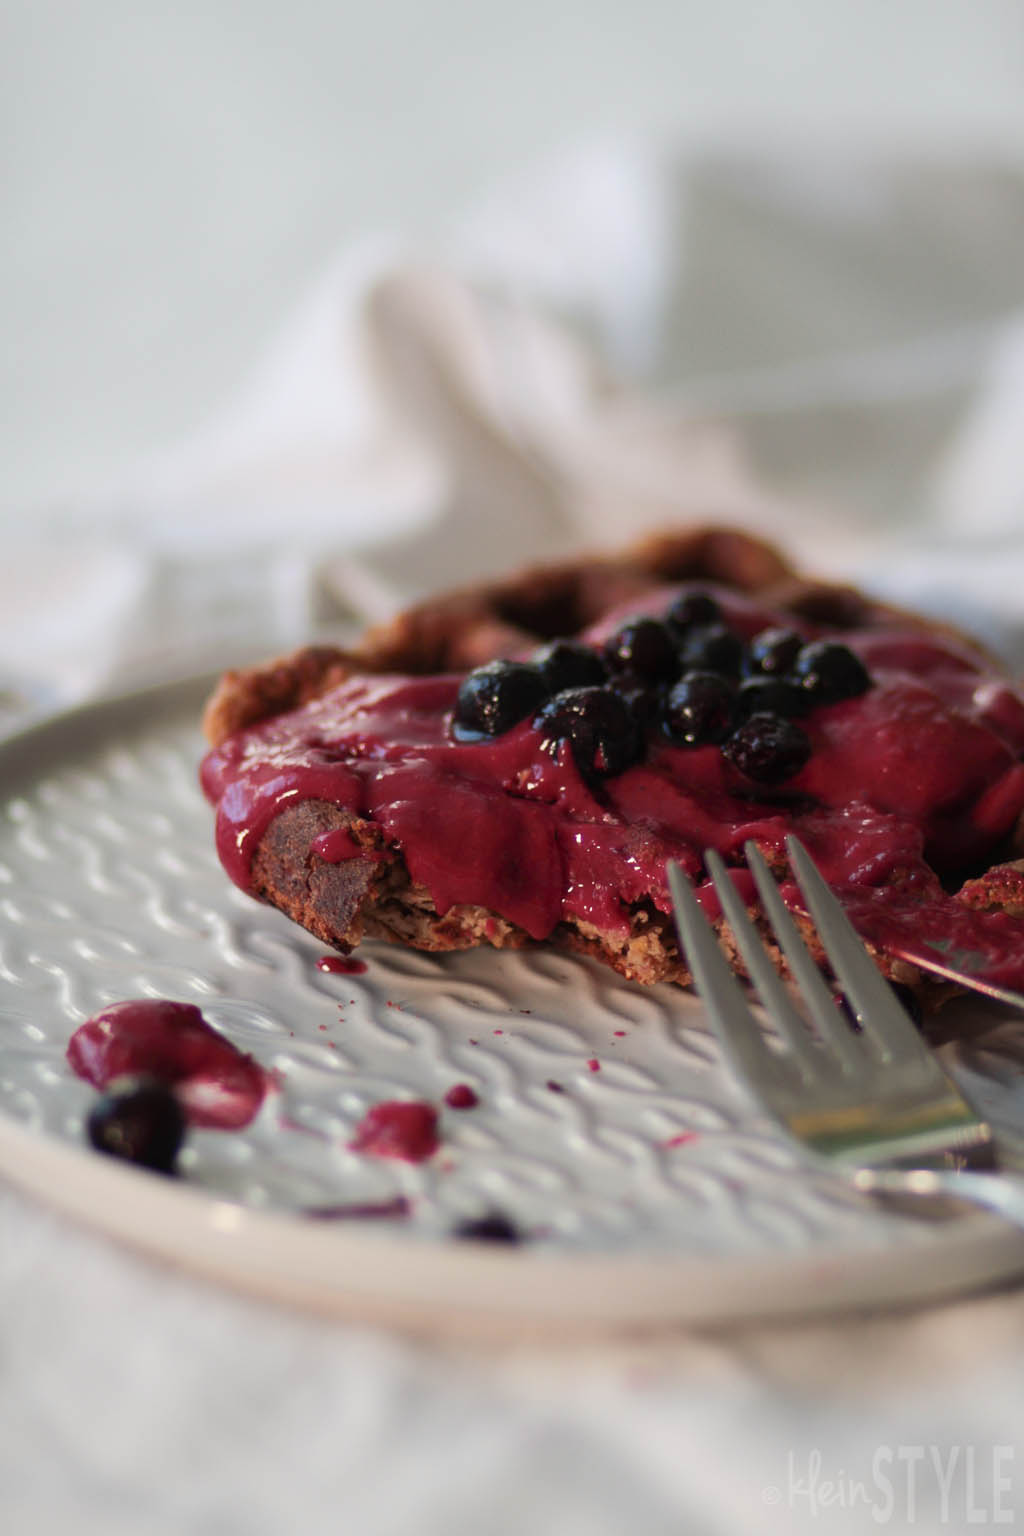 (Deutsch) Food Love Friday : Esselstyn's Pflanzen-Mission {inkl. Knusperwaffel-Rezept}